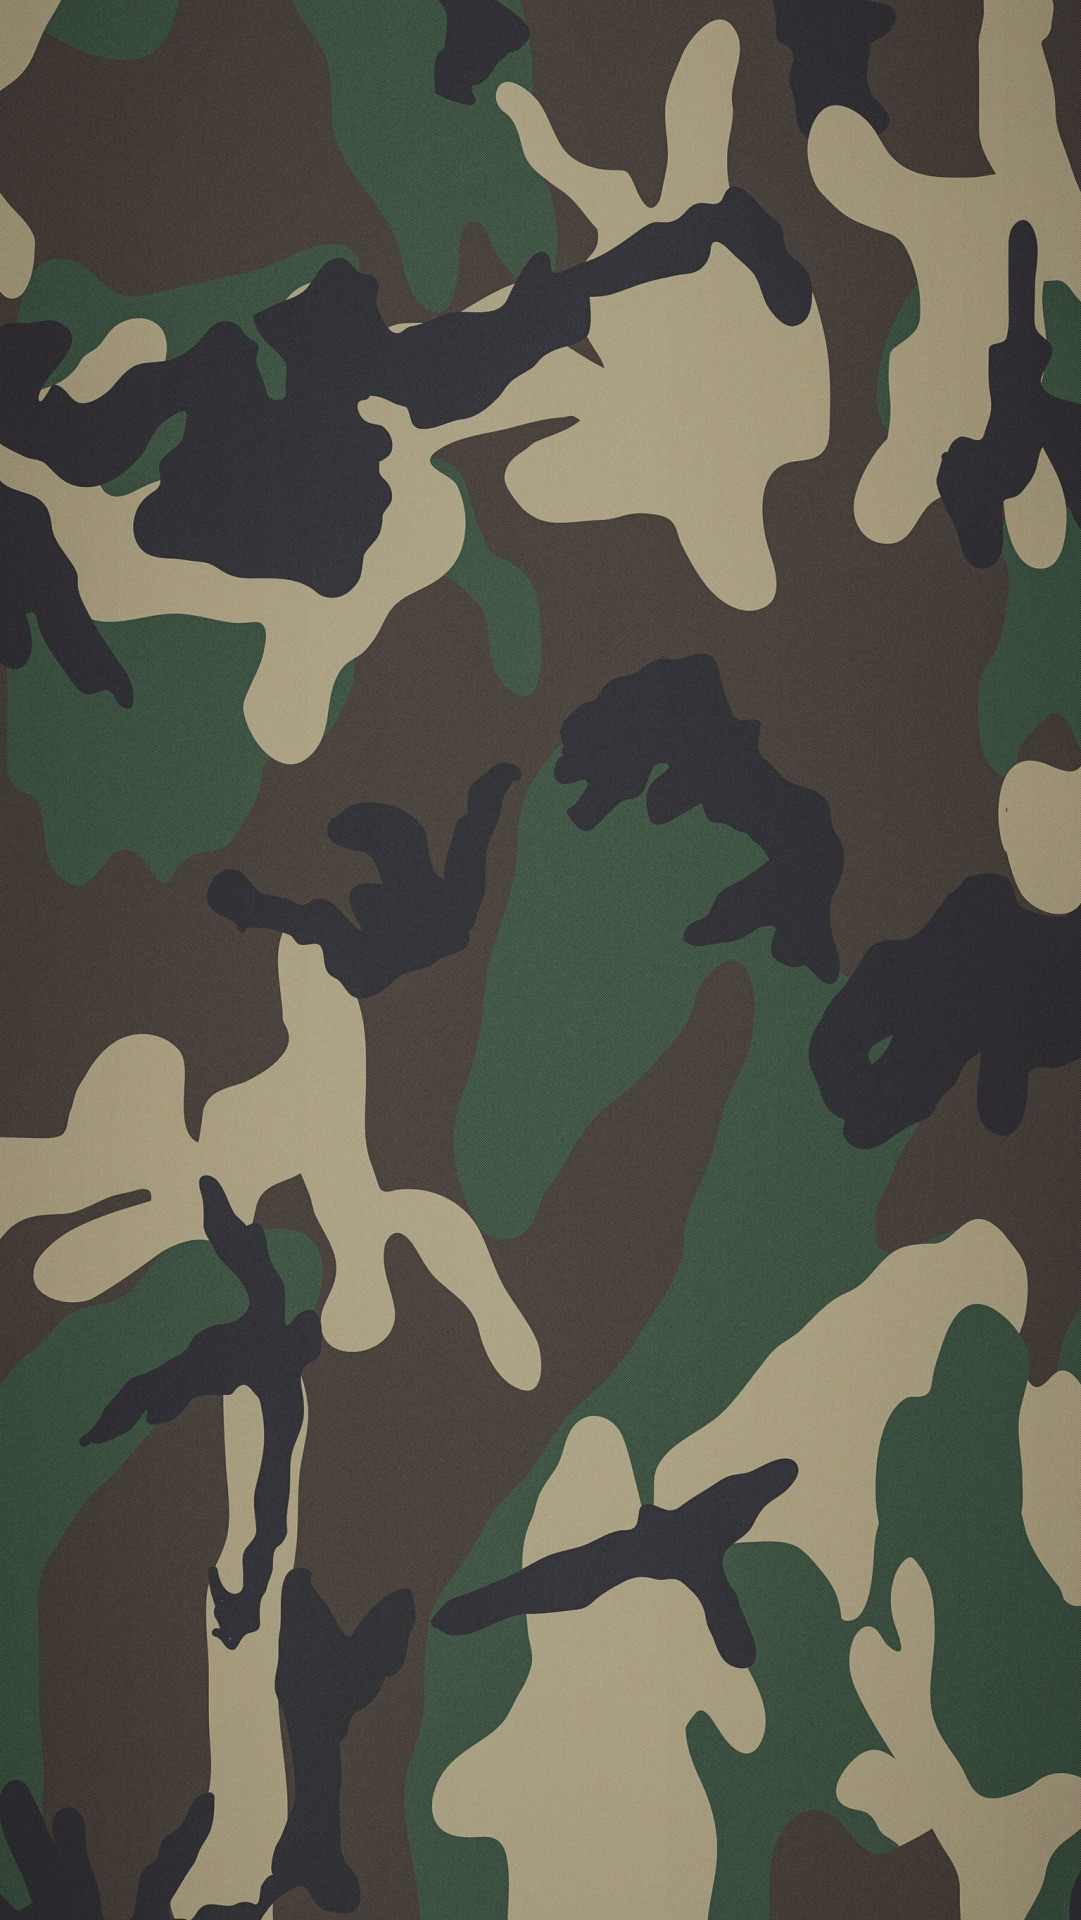 ☺iphone ios 7 wallpaper tumblr for ipad